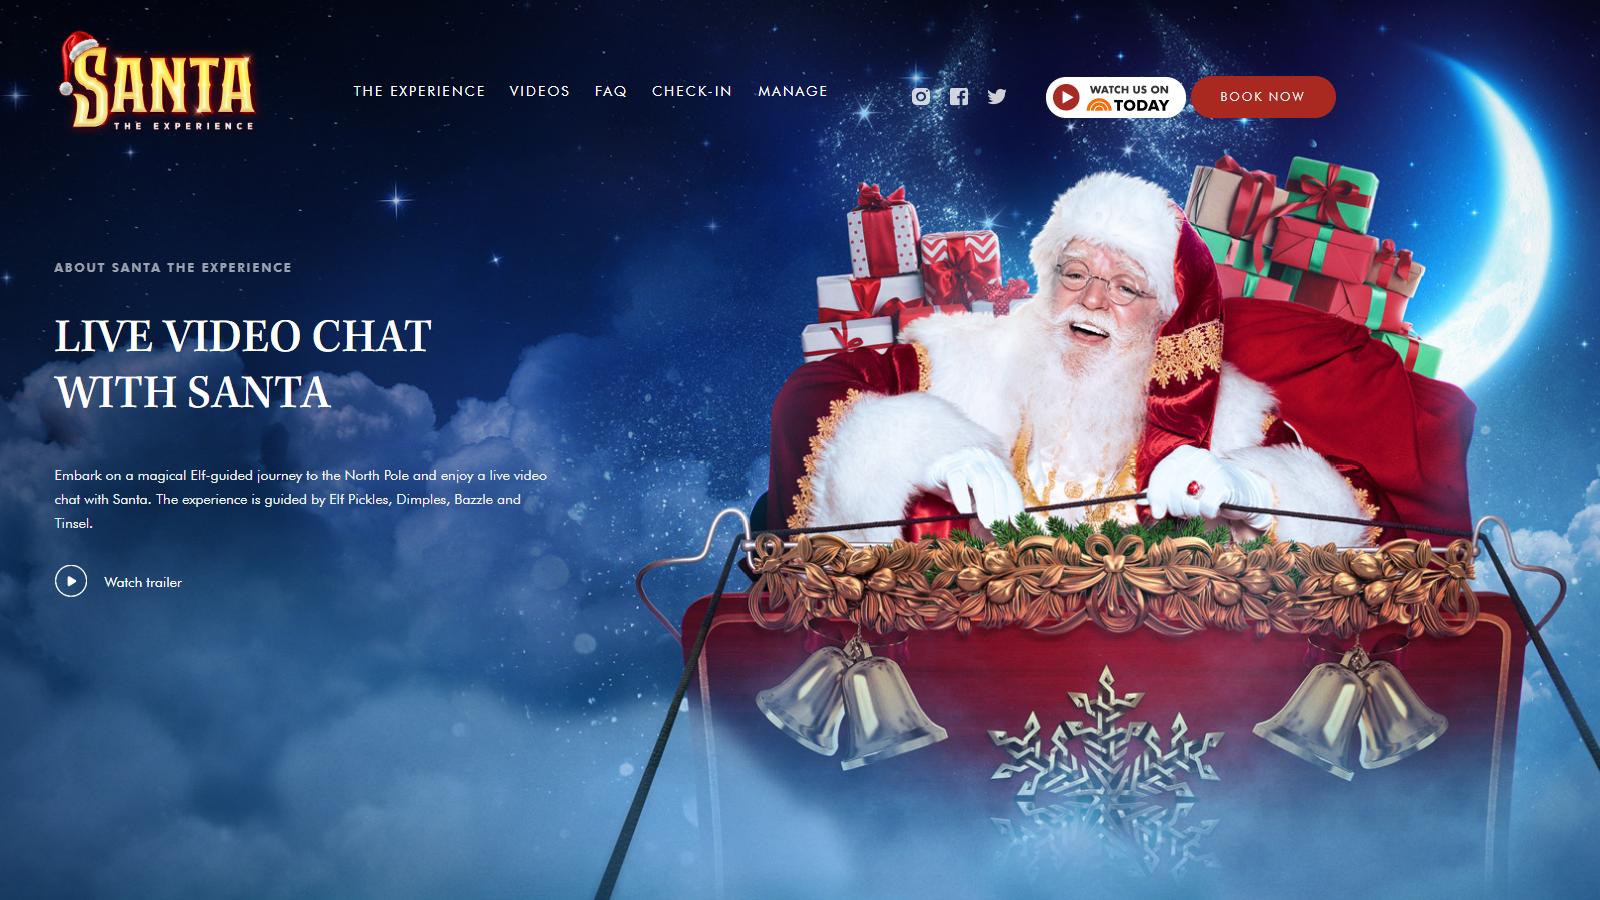 Santa the Experience virtual santa calls with santa in his sleigh in the night sky